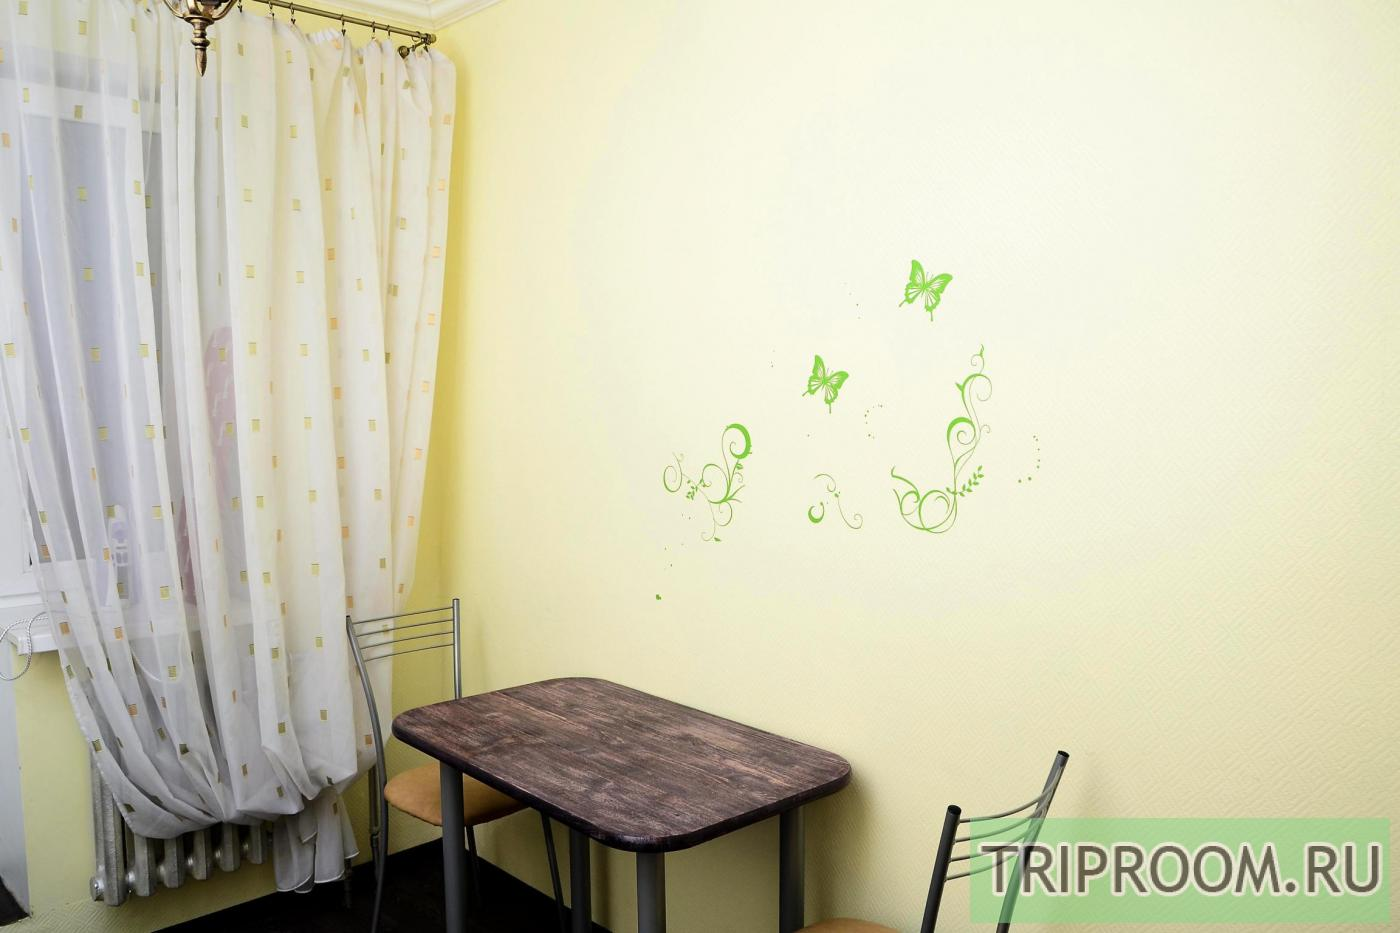 1-комнатная квартира посуточно (вариант № 14713), ул. Петра Смородина улица, фото № 9